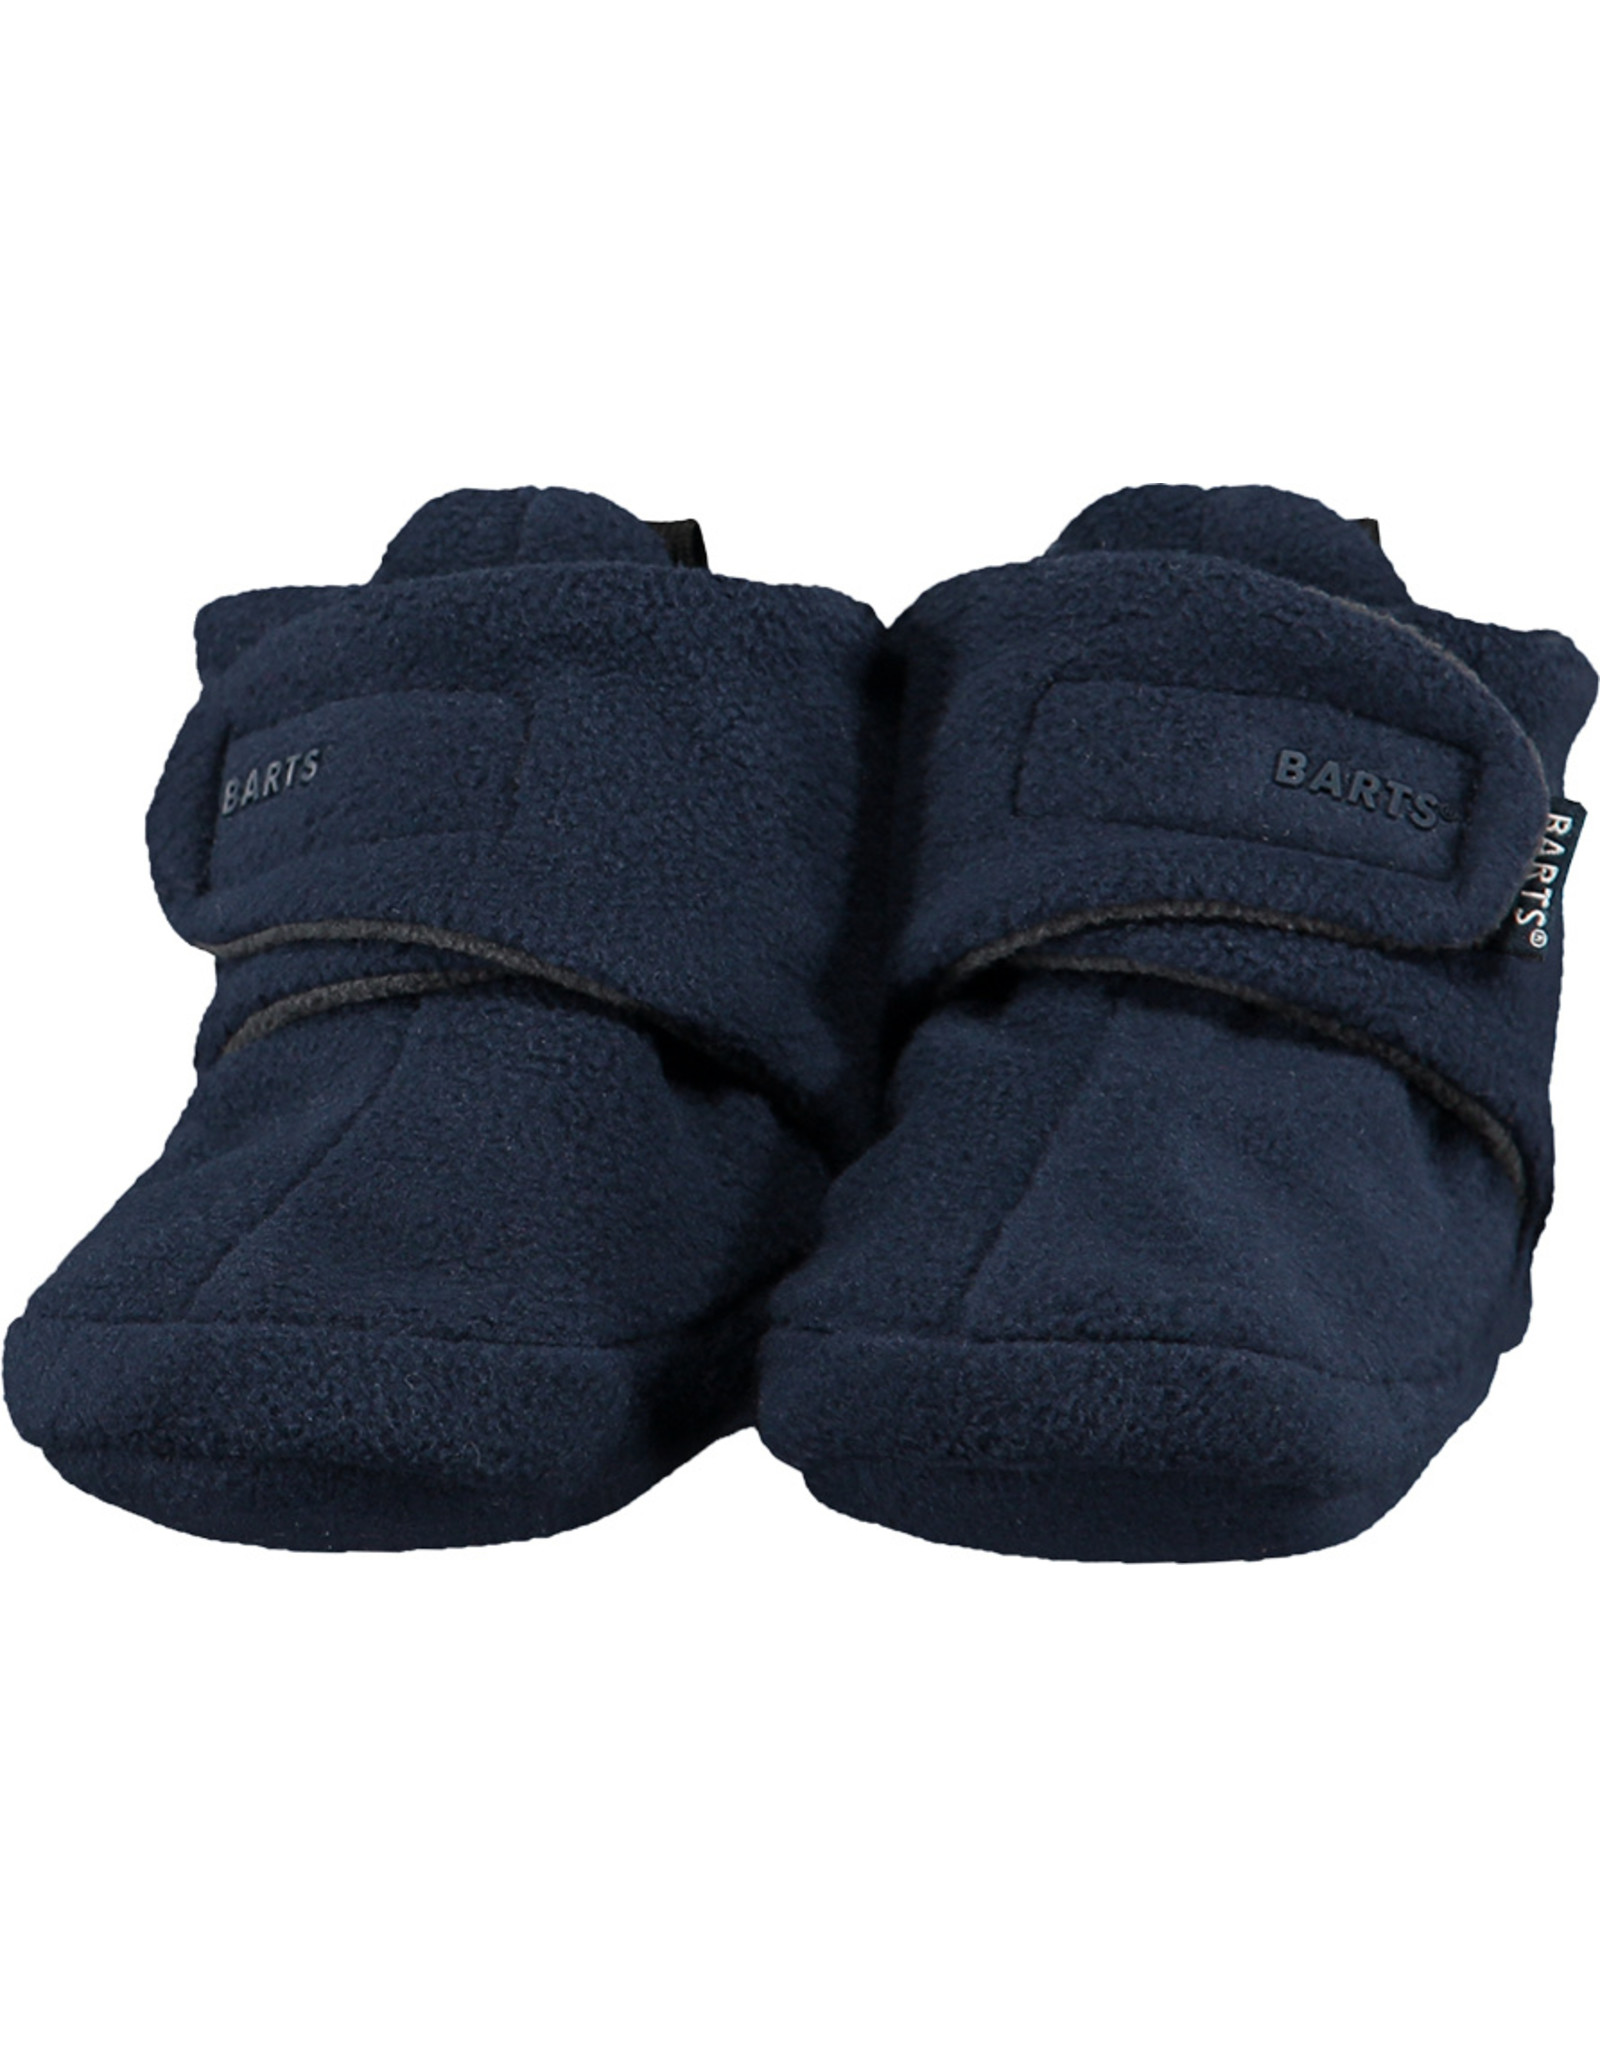 Barts Fleece Shoes, navy